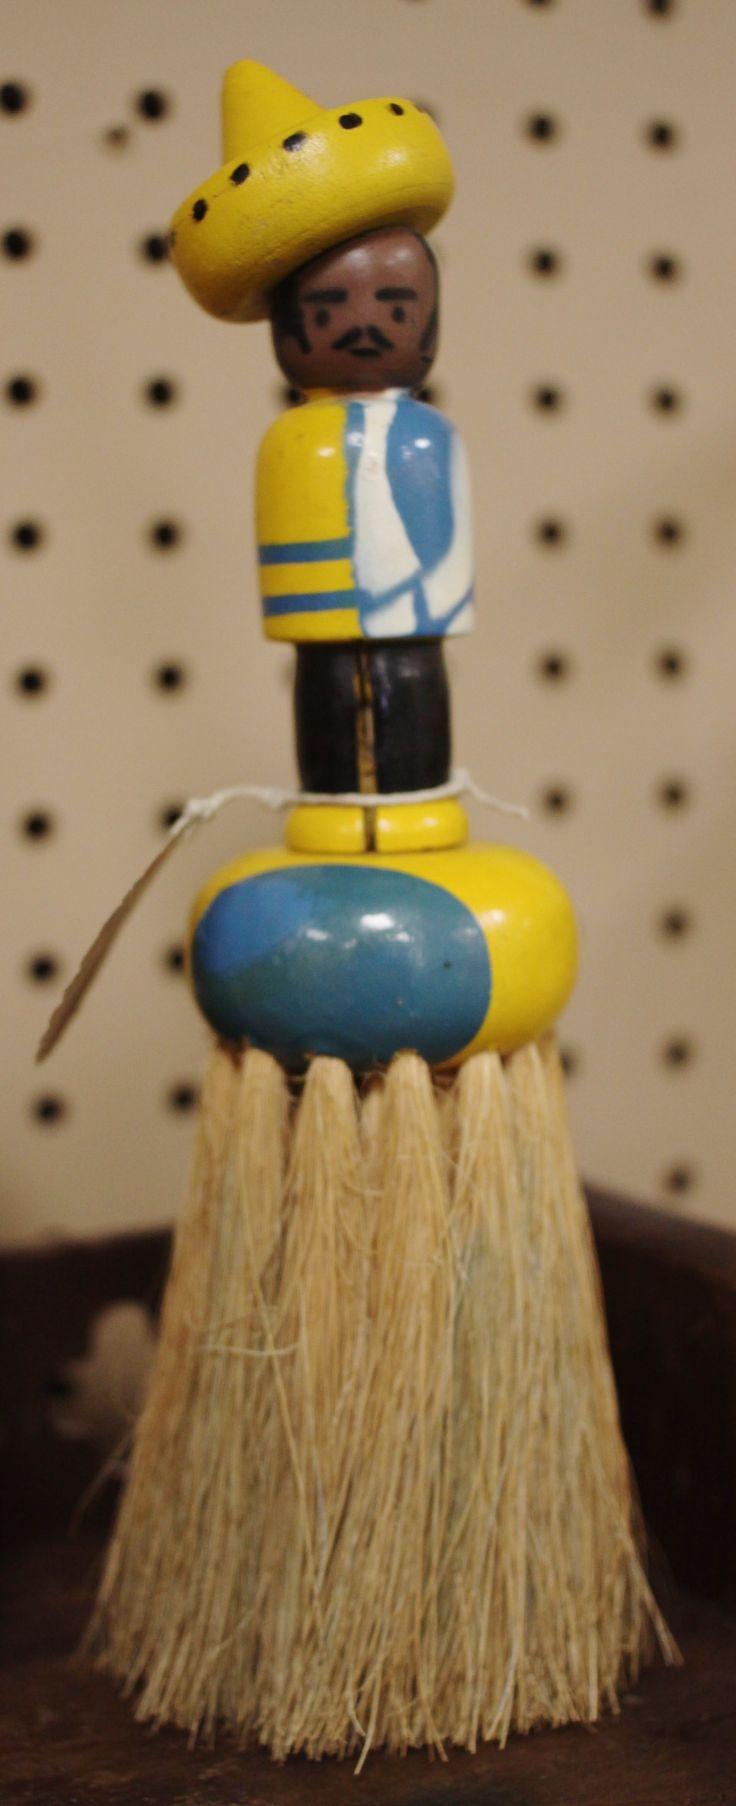 Vintage Table Crumb Brush At Homestead Handcrafts, San Antonio, Texas.